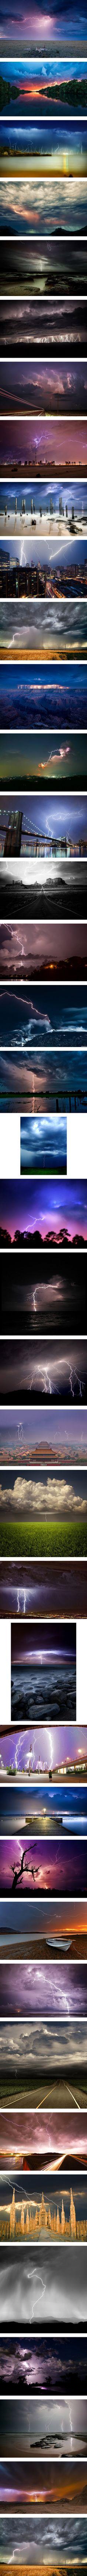 Stunning Lightning Pics   twilight     http://www.amazon.com/gp/product/B009WDOPNO?ie=UTF8=A1JZHG9III7SDE=GANDALF%20THE%20GRAYZZ%20BOOKSTORE  1, 4, 7, 16, 20, 22, 29, 31, 36, 38